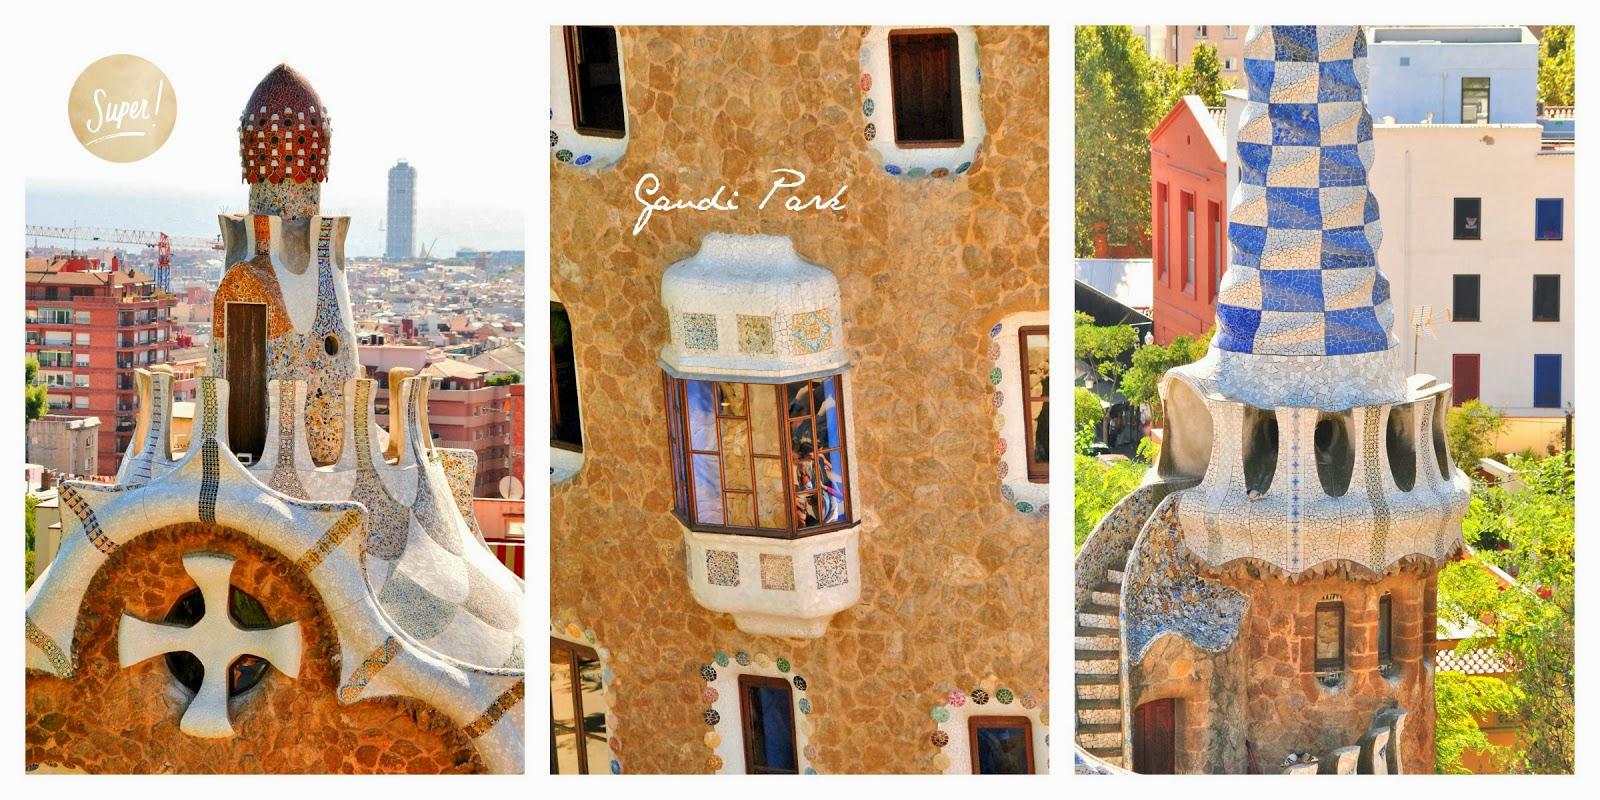 Hiszpania Gaudi